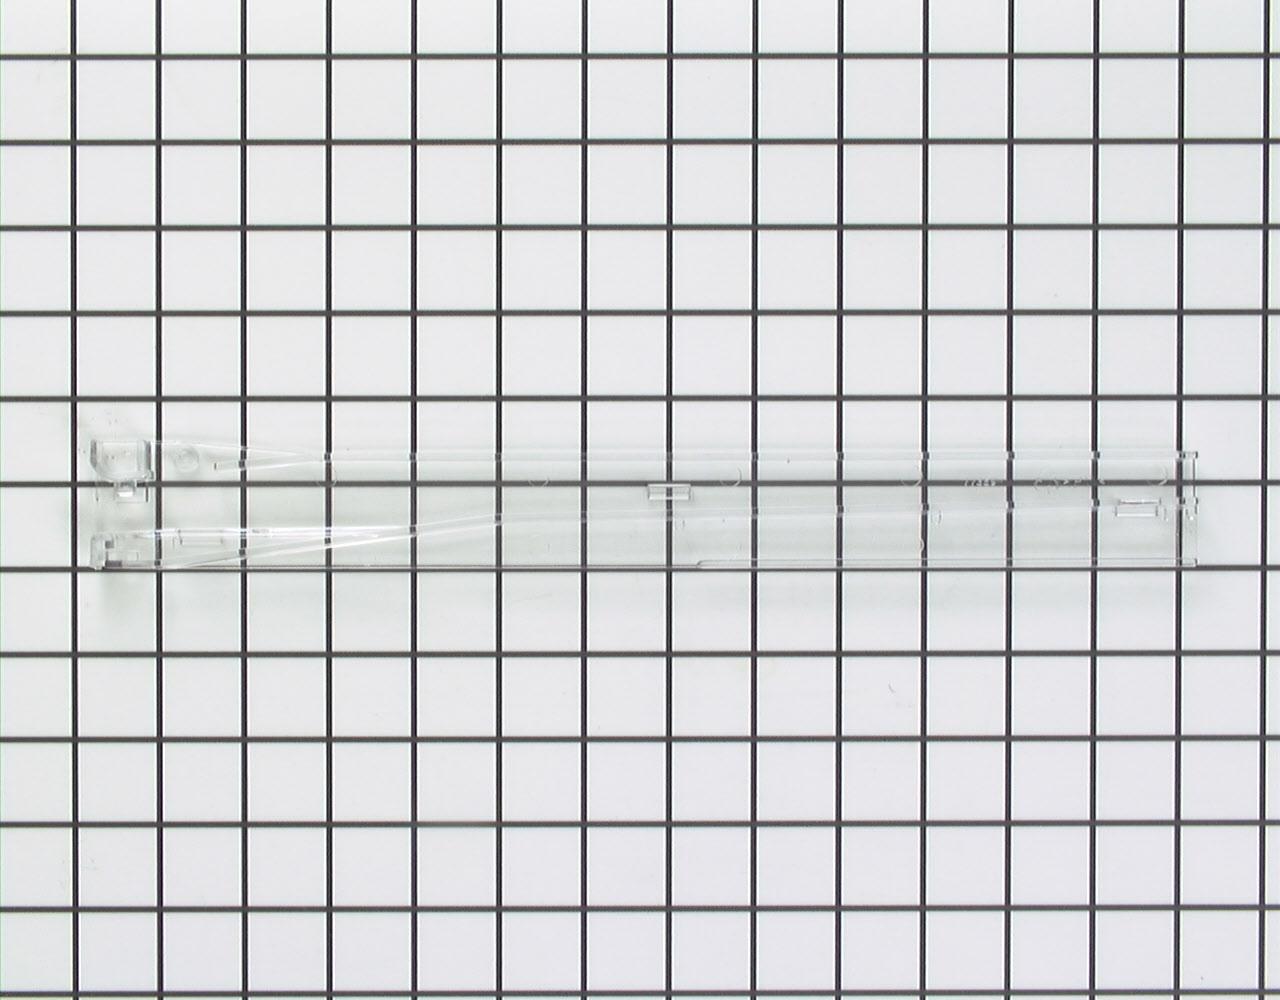 WP67002191 Crosley Refrigerator Part -Drawer Slide Rail